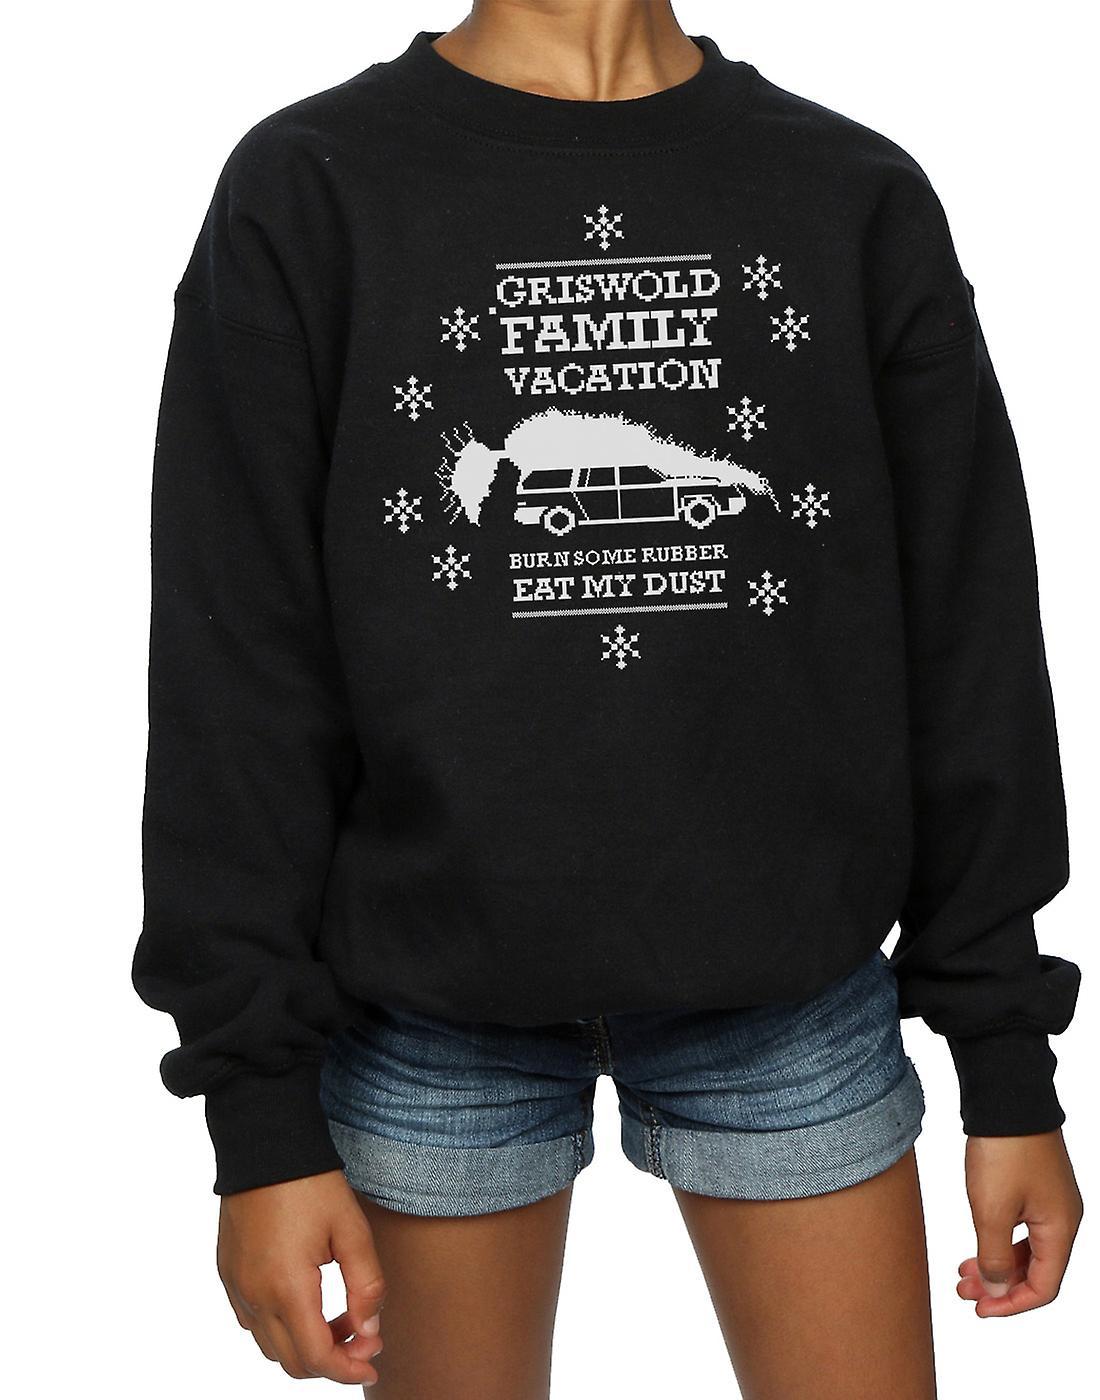 National Lampoon's Christmas Vacation Girls Eat My Dust Sweatshirt